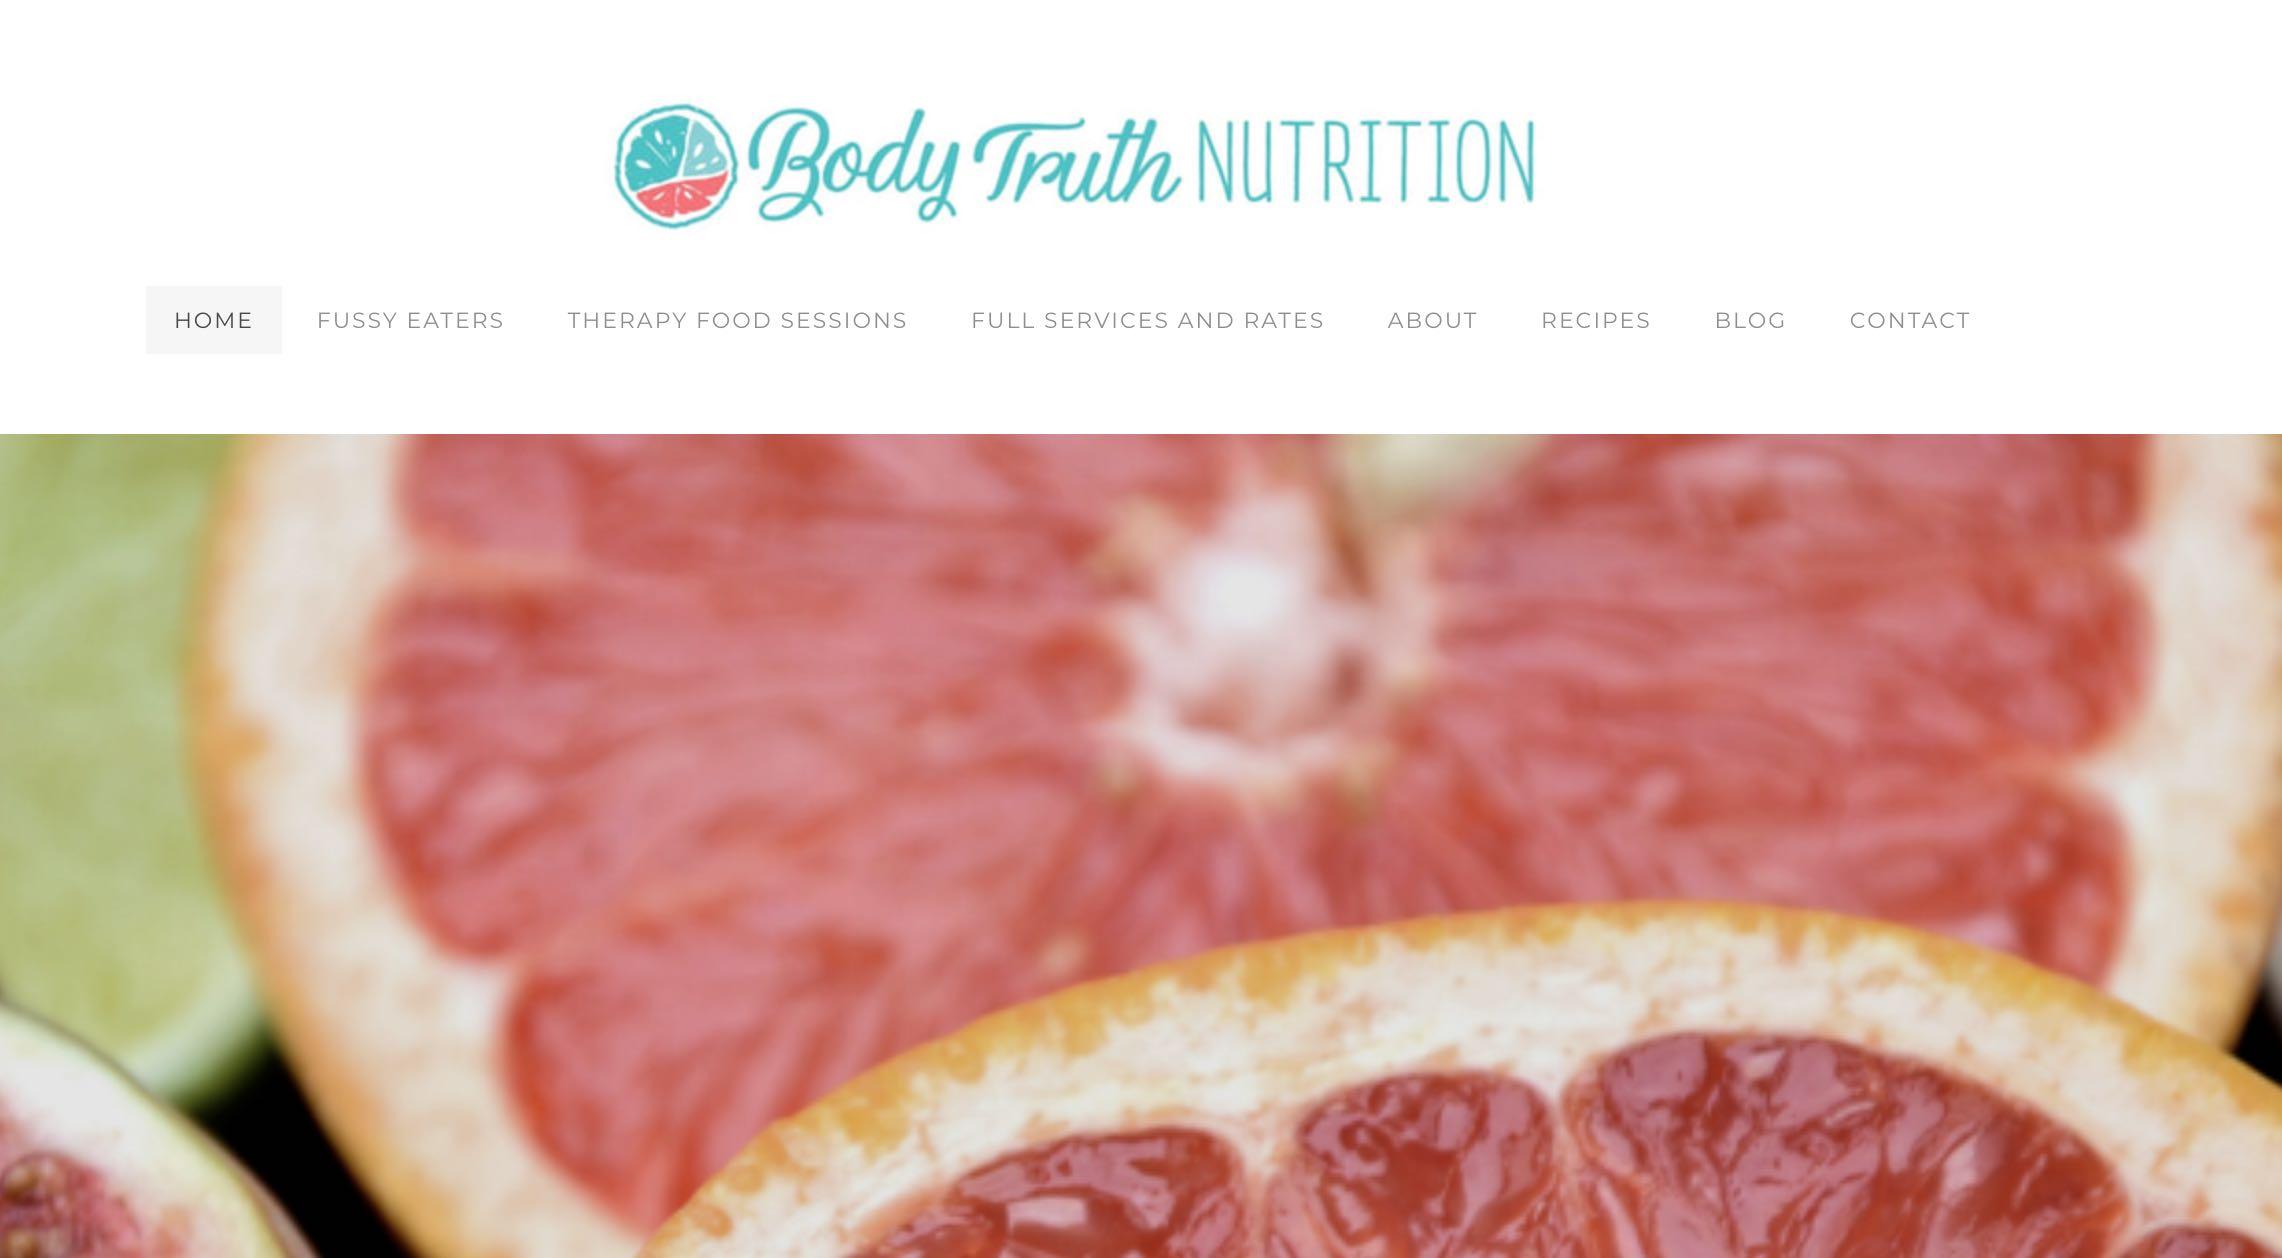 Body Truth Nutrition